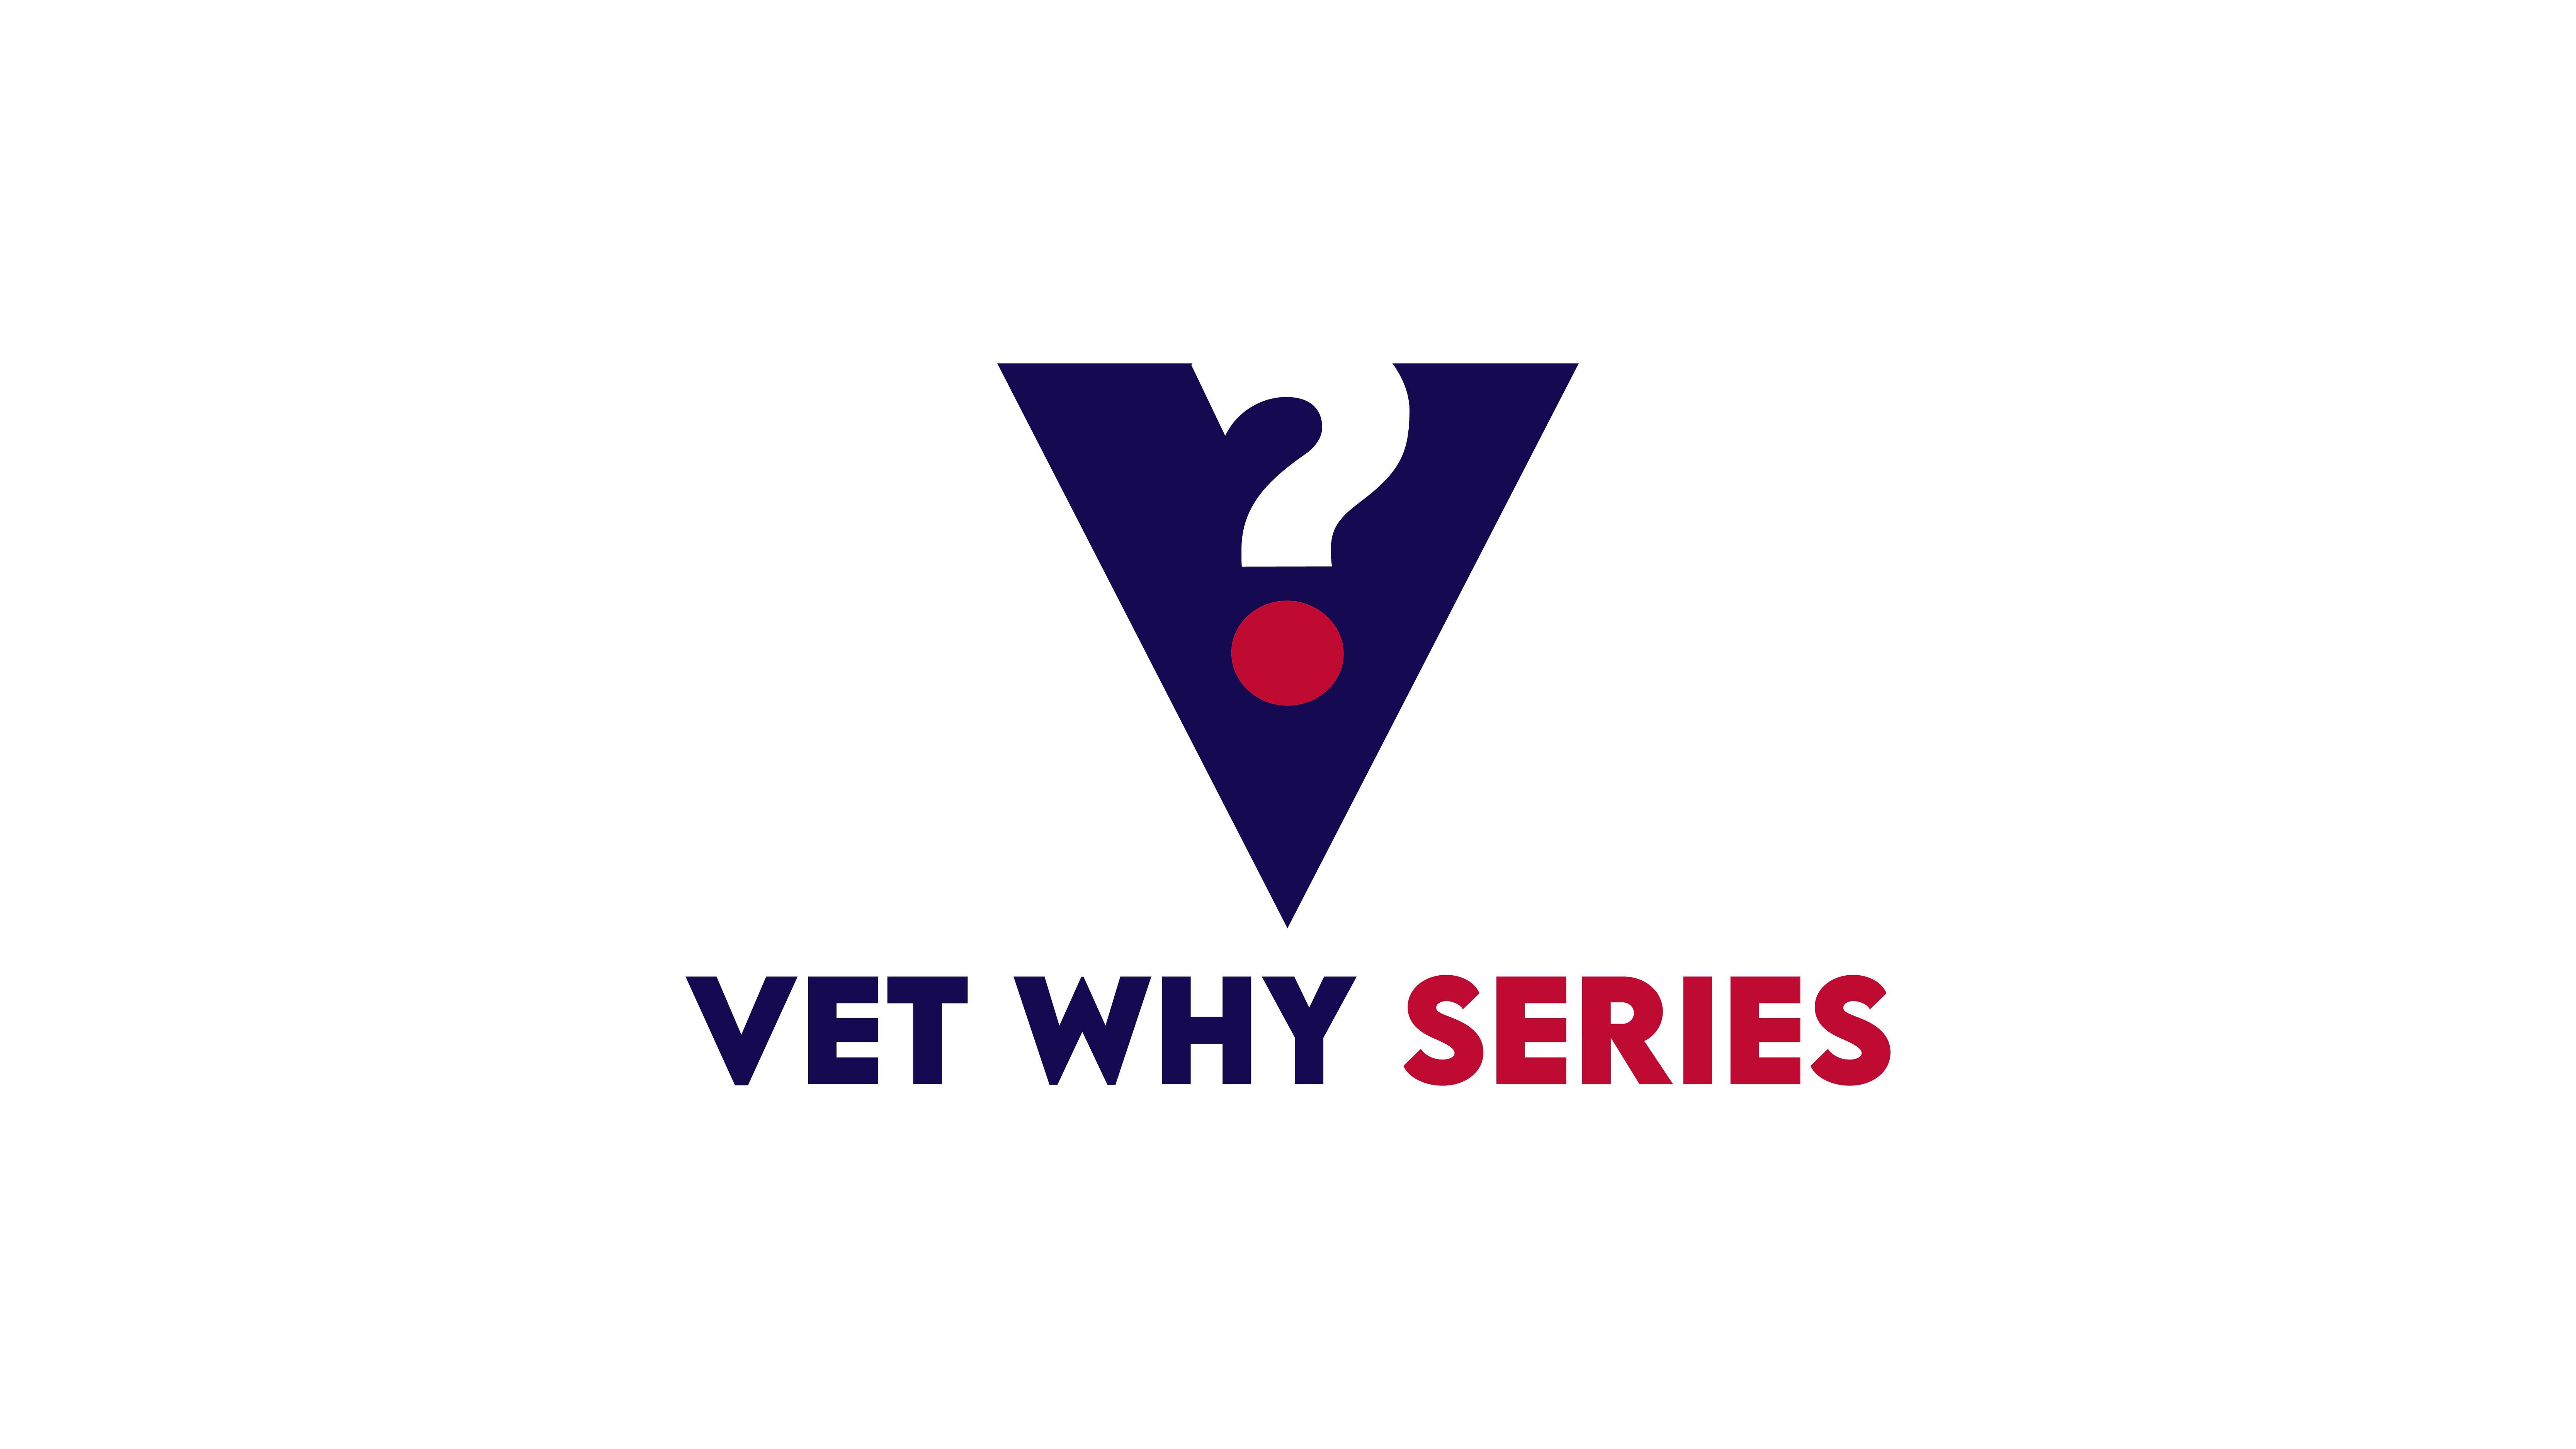 Vet Why Series